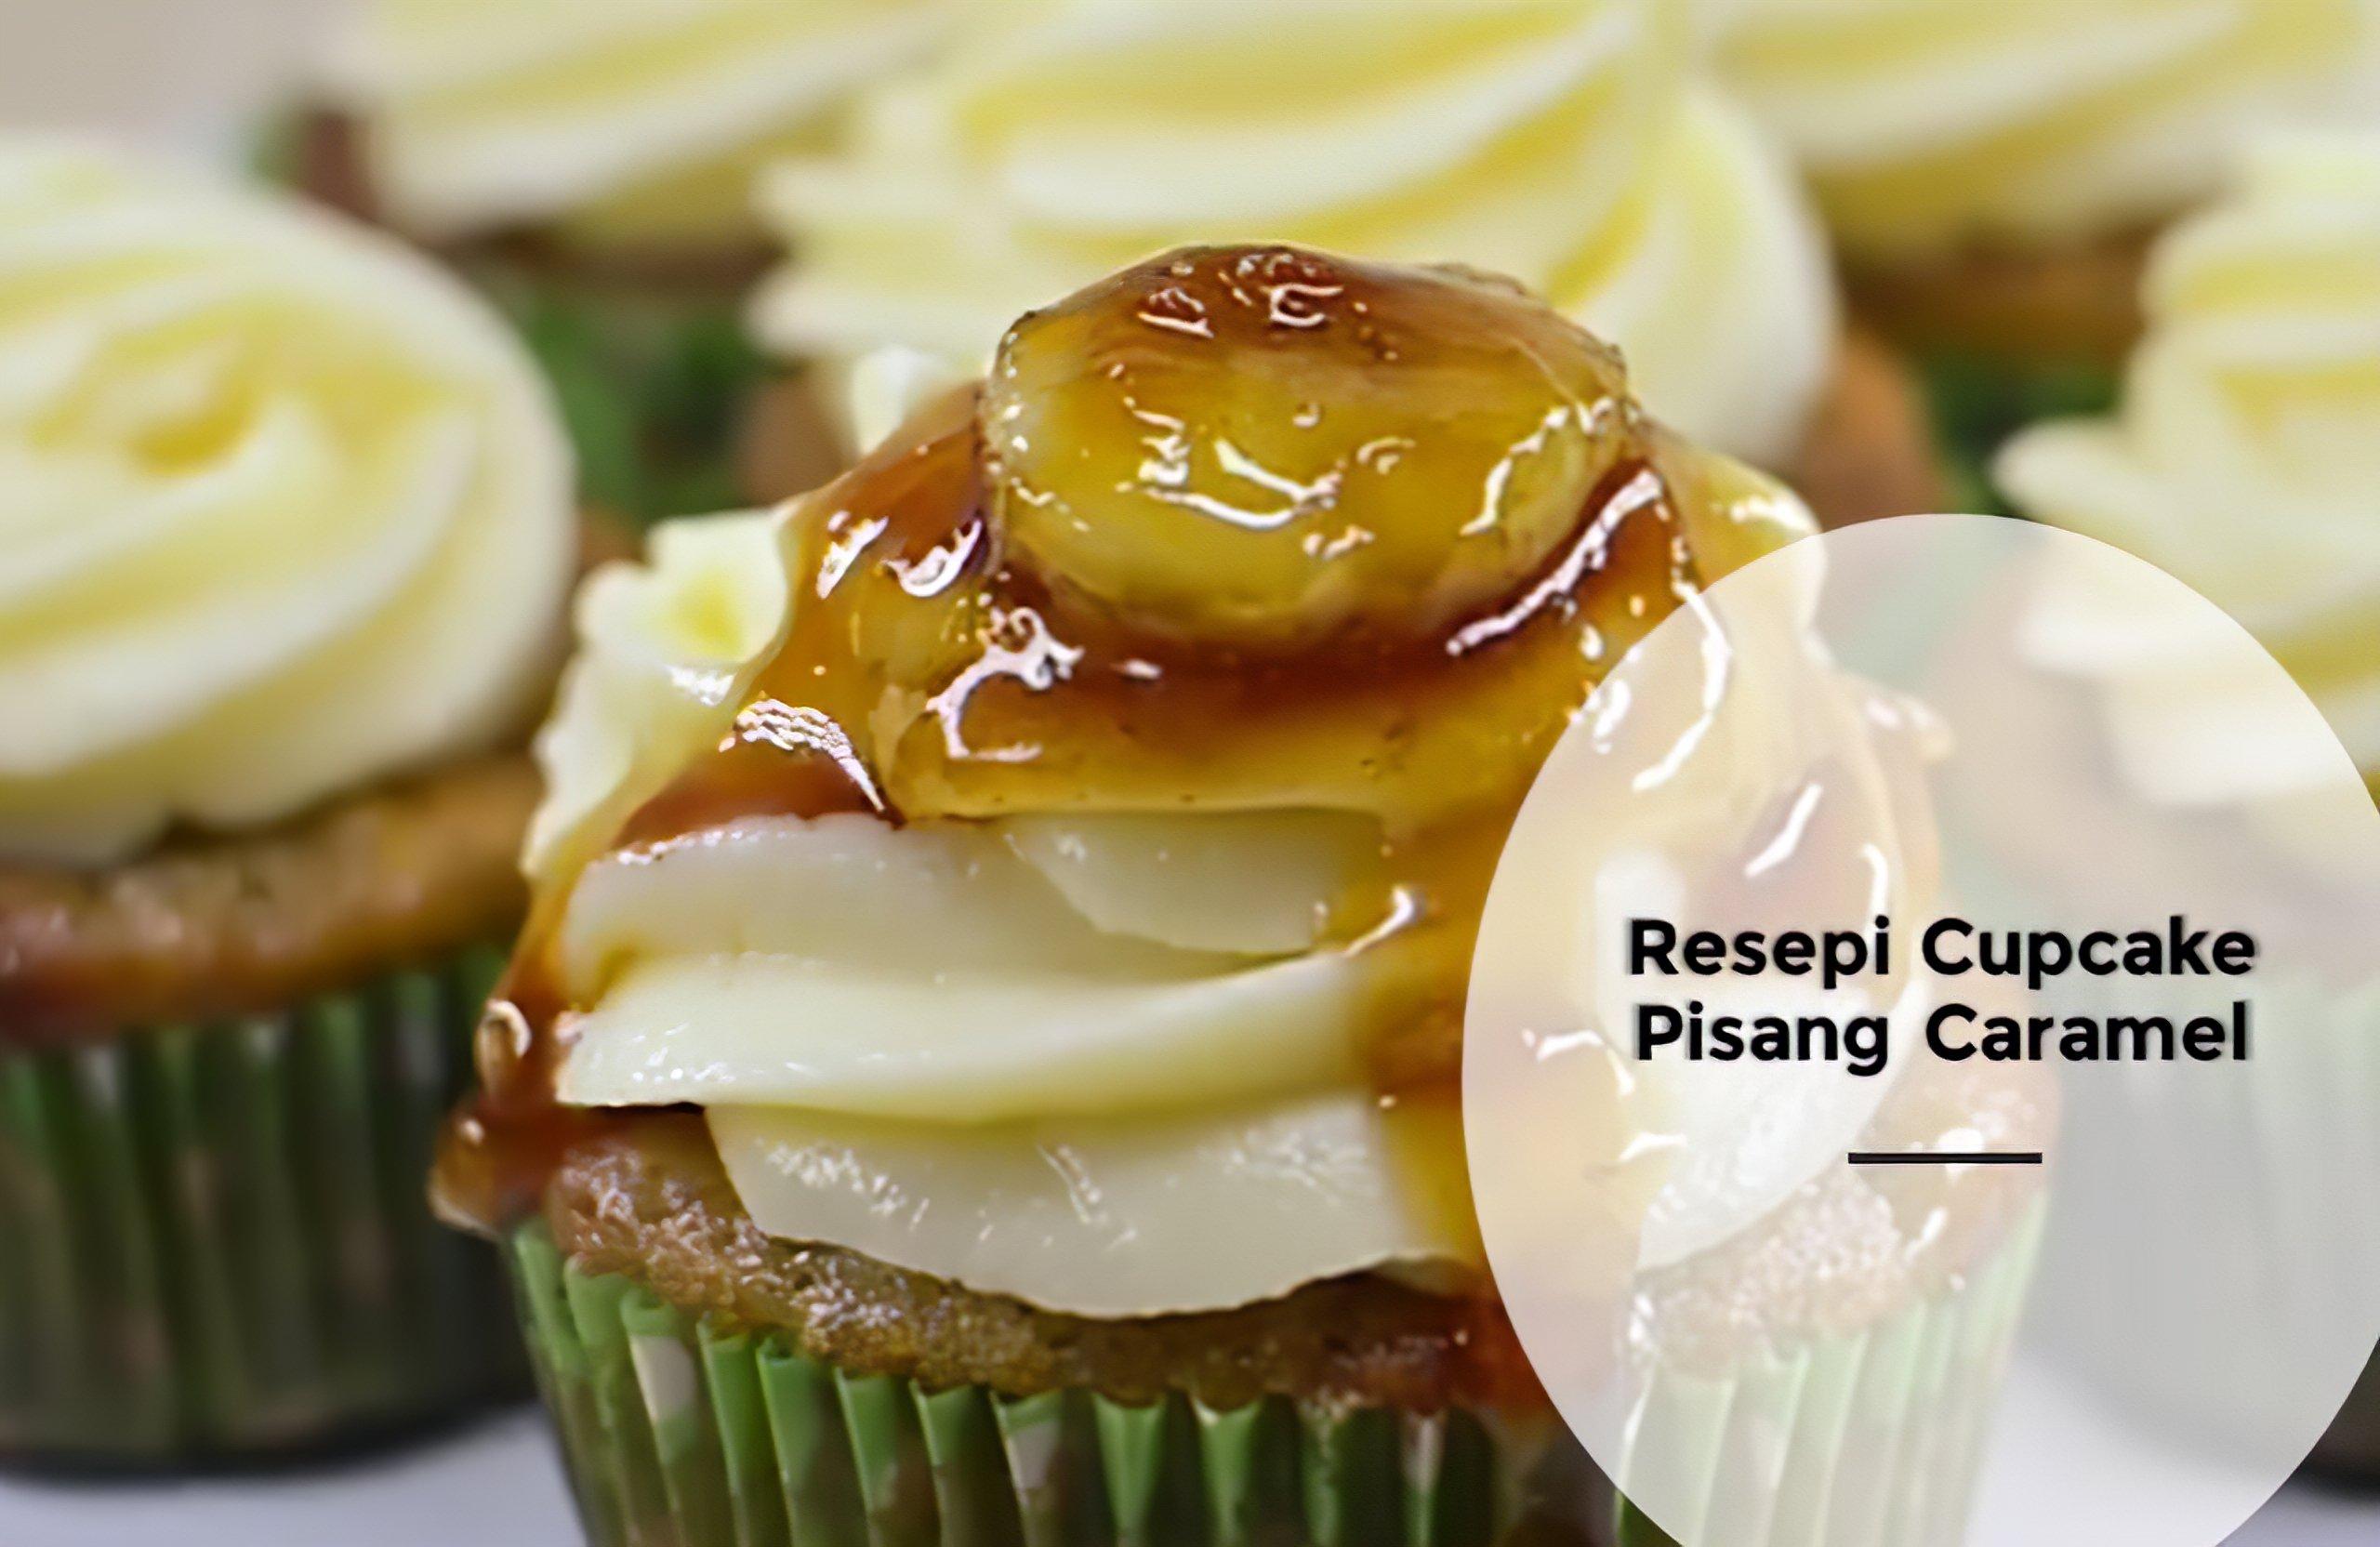 Resepi Cupcake Pisang Caramel